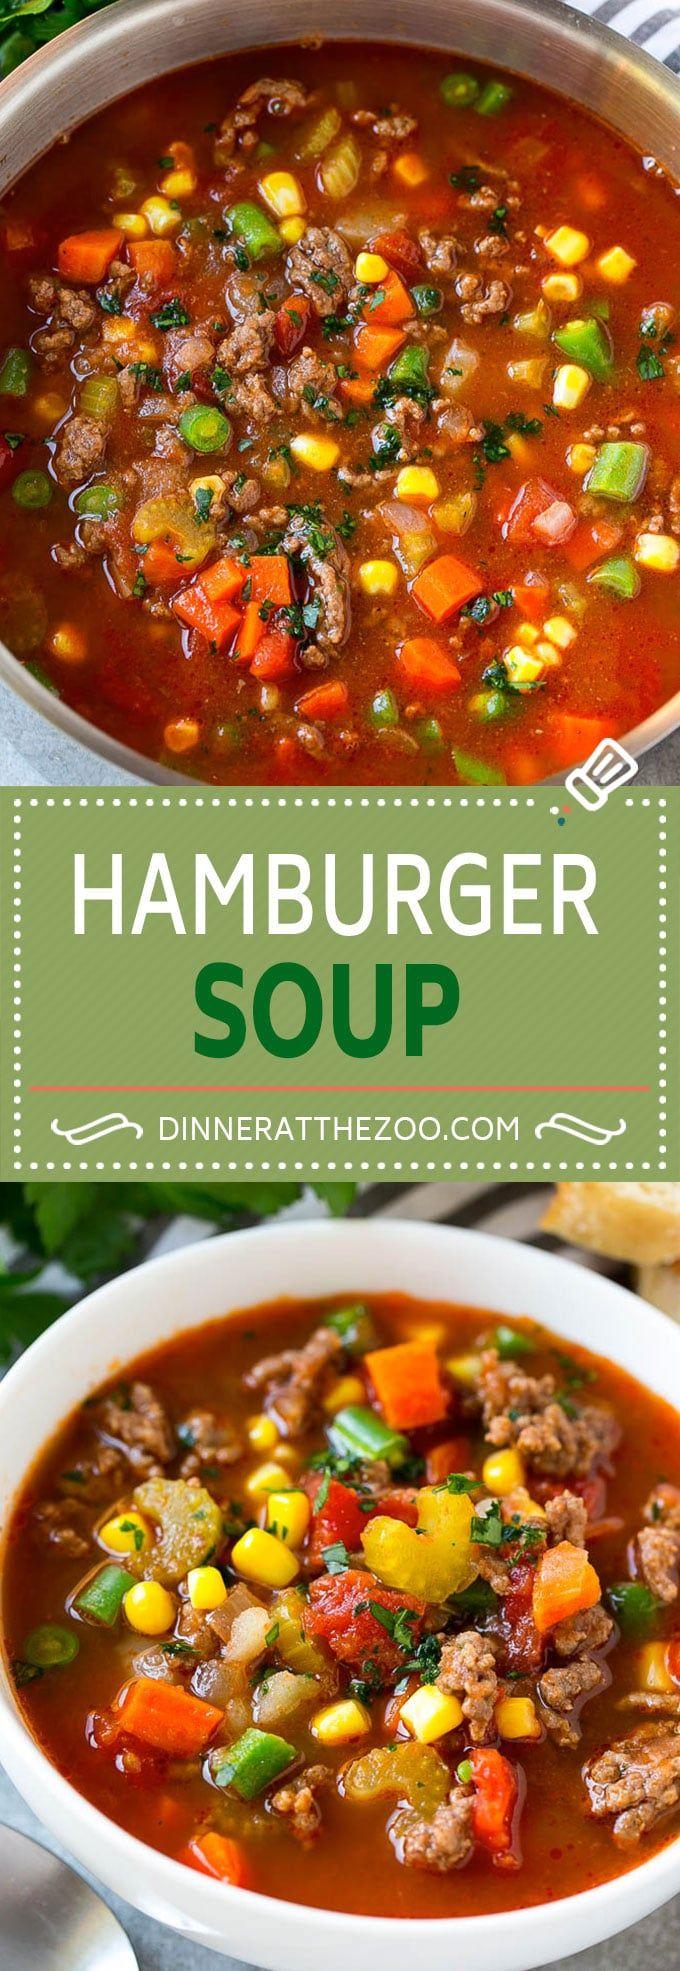 Hamburger Soup Recipe Hamburger And Vegetable Soup Hamburger And Potato Soup Hamburger Stew Ground Beef Soup Recipes Soup With Ground Beef Soup Dinner